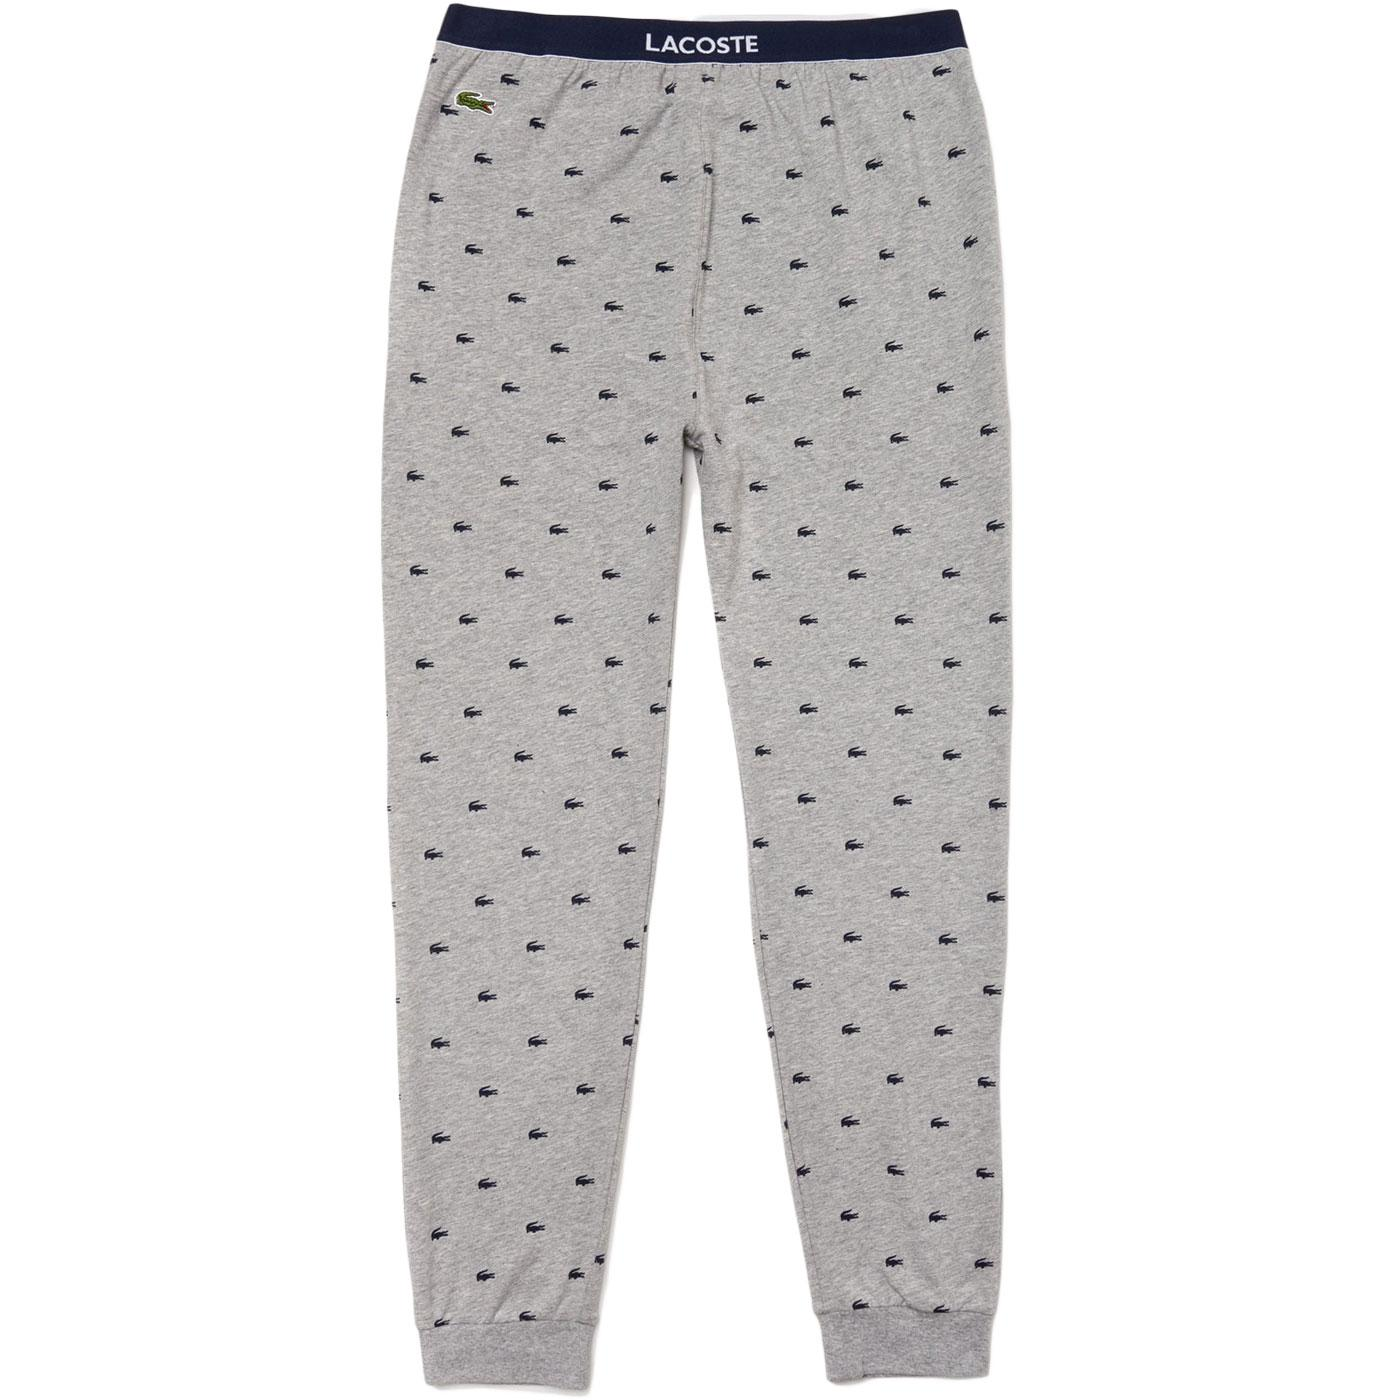 LACOSTE Retro Plush Jogger Pyjama Lounge Pants G